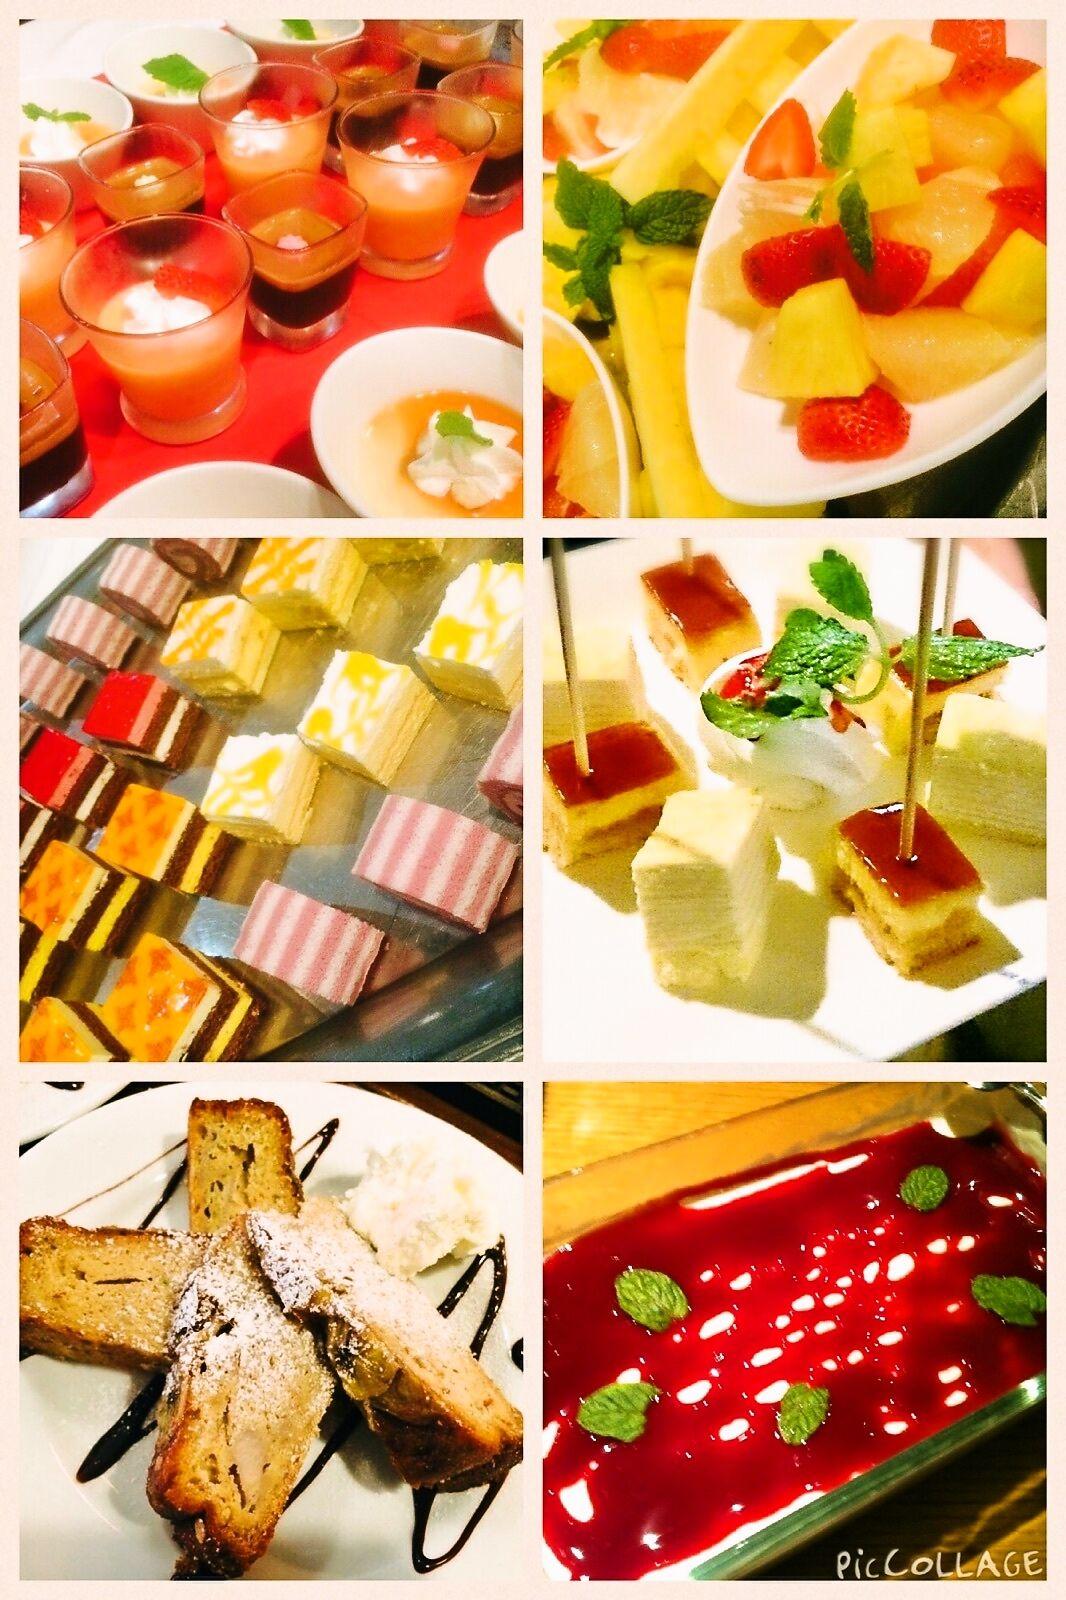 foodpic6231619